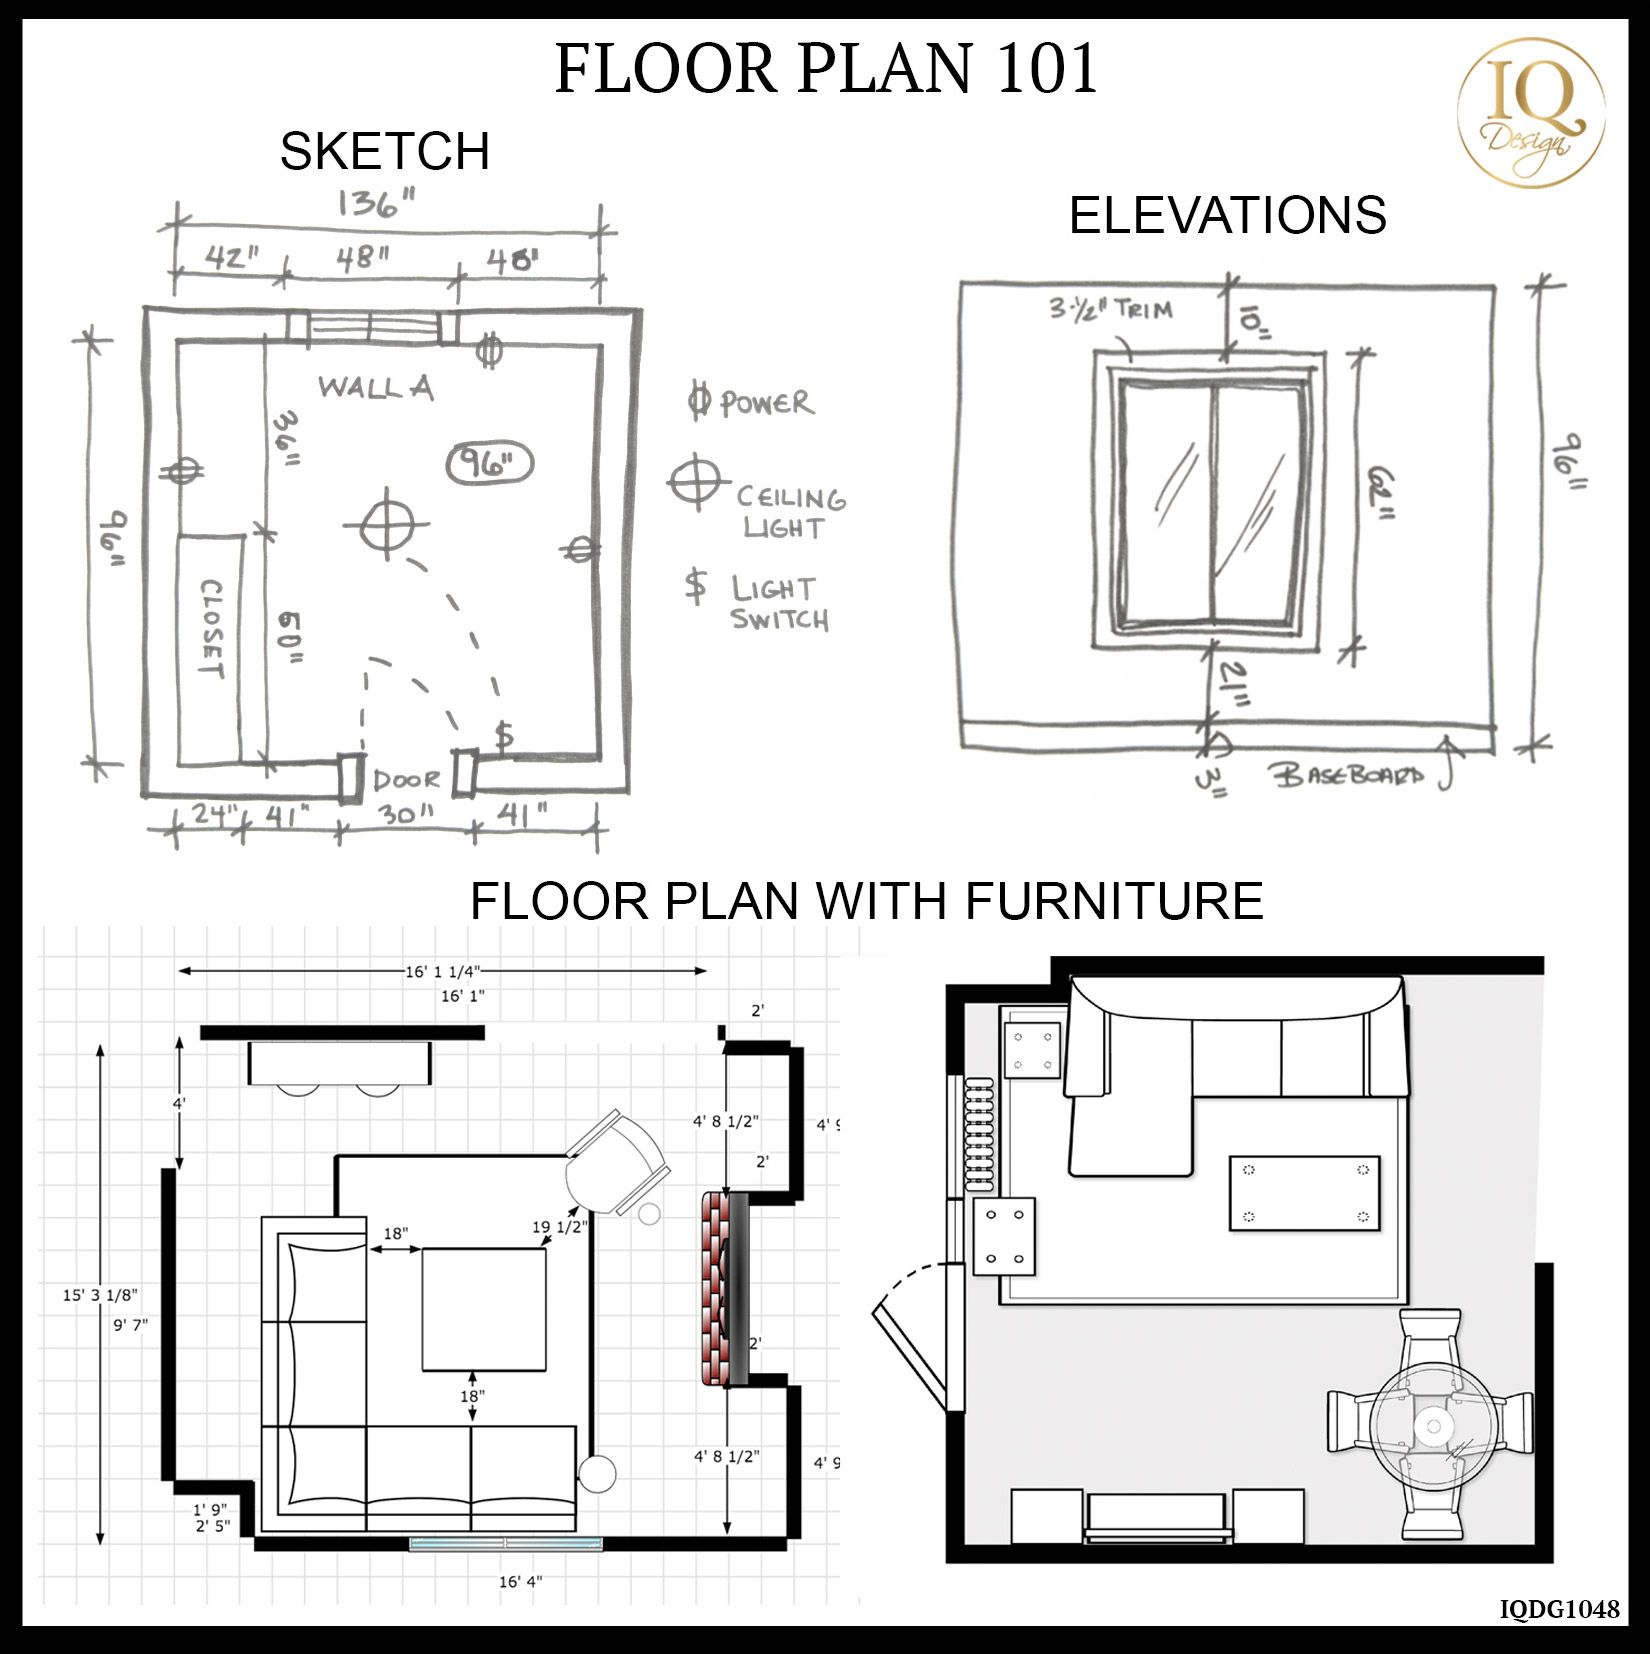 Floor Plan 101 Tips To Help You Measure For A Room Makeover Iq Design Living Room Floor Plans Floor Plans Room Makeover